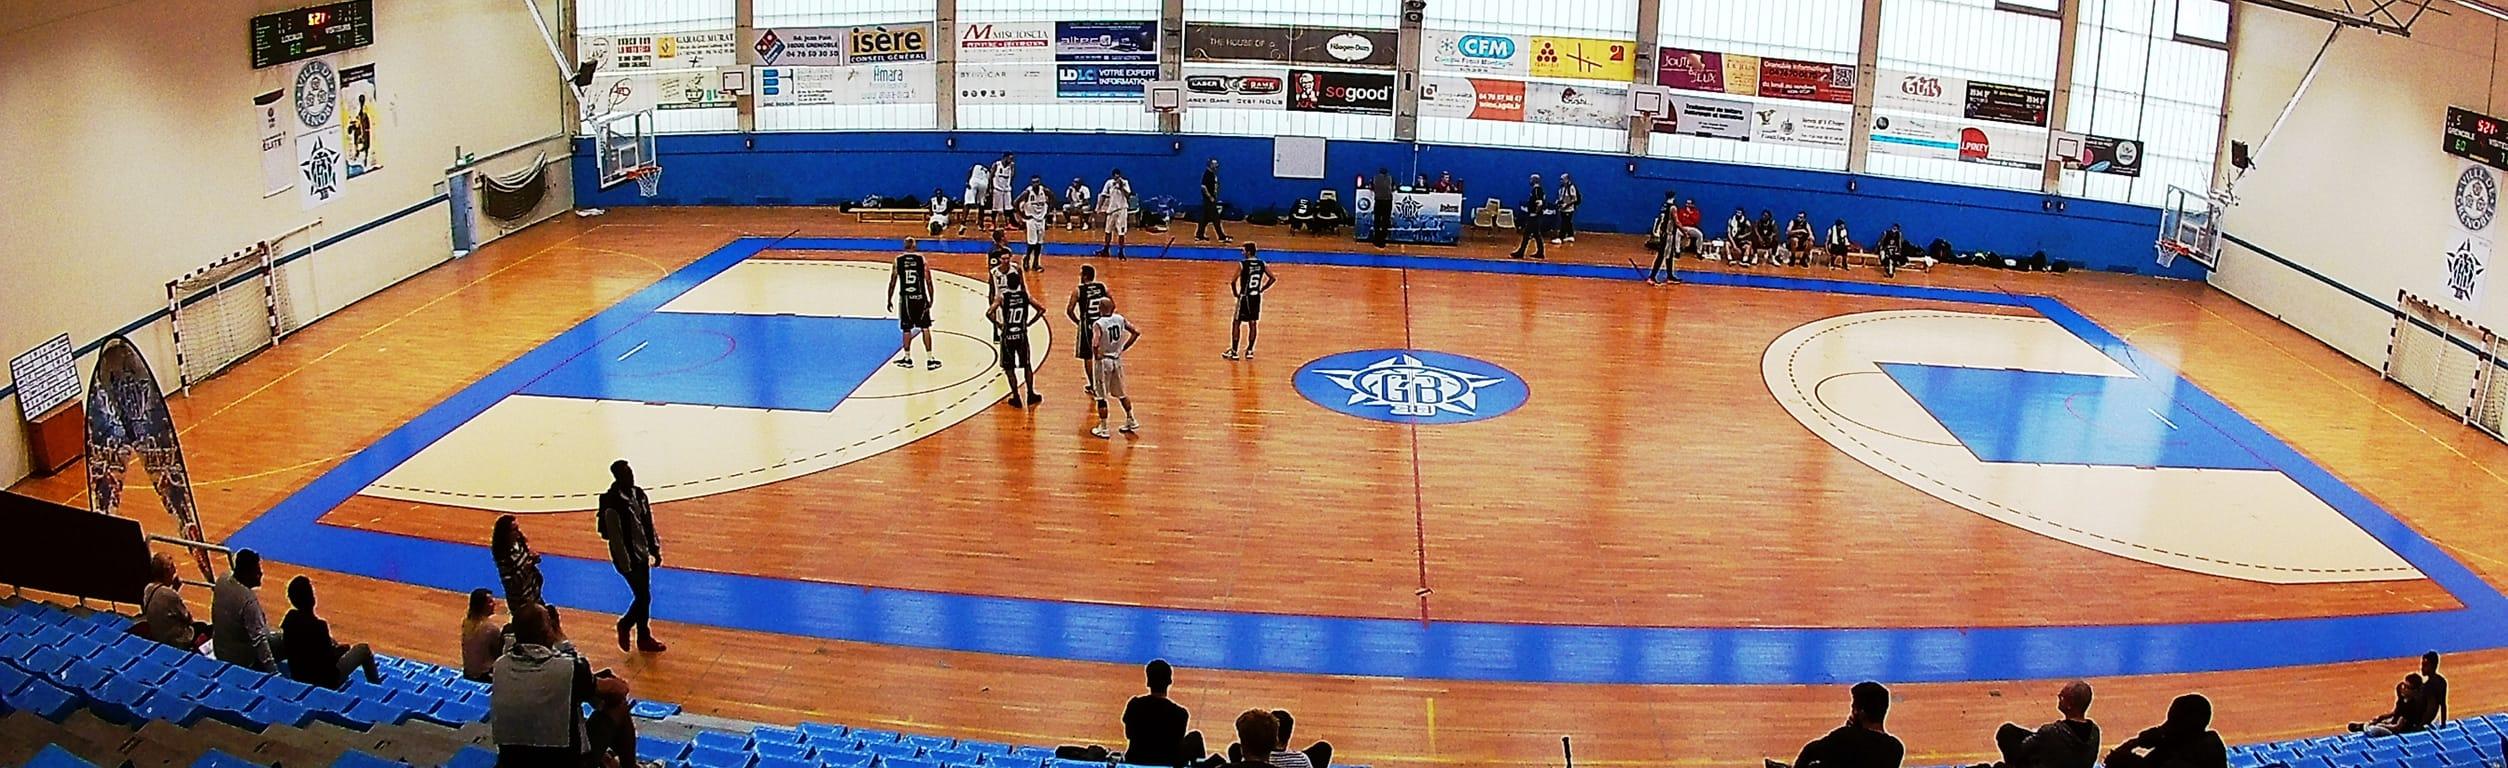 Grenoble Basket 38